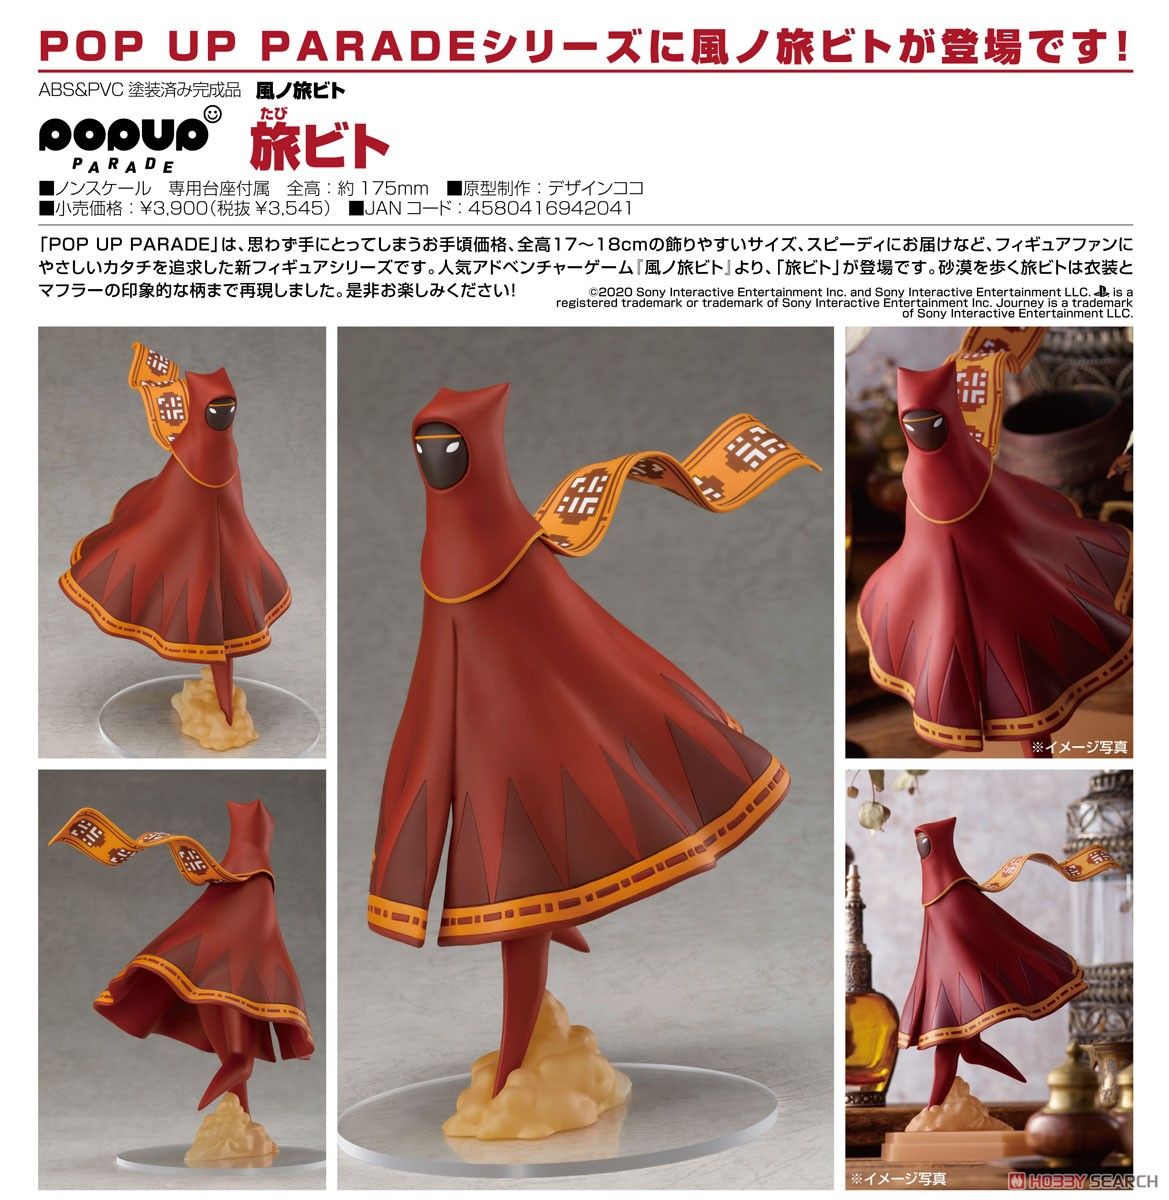 POP UP PARADE『旅ビト』風ノ旅ビト 完成品フィギュア-010